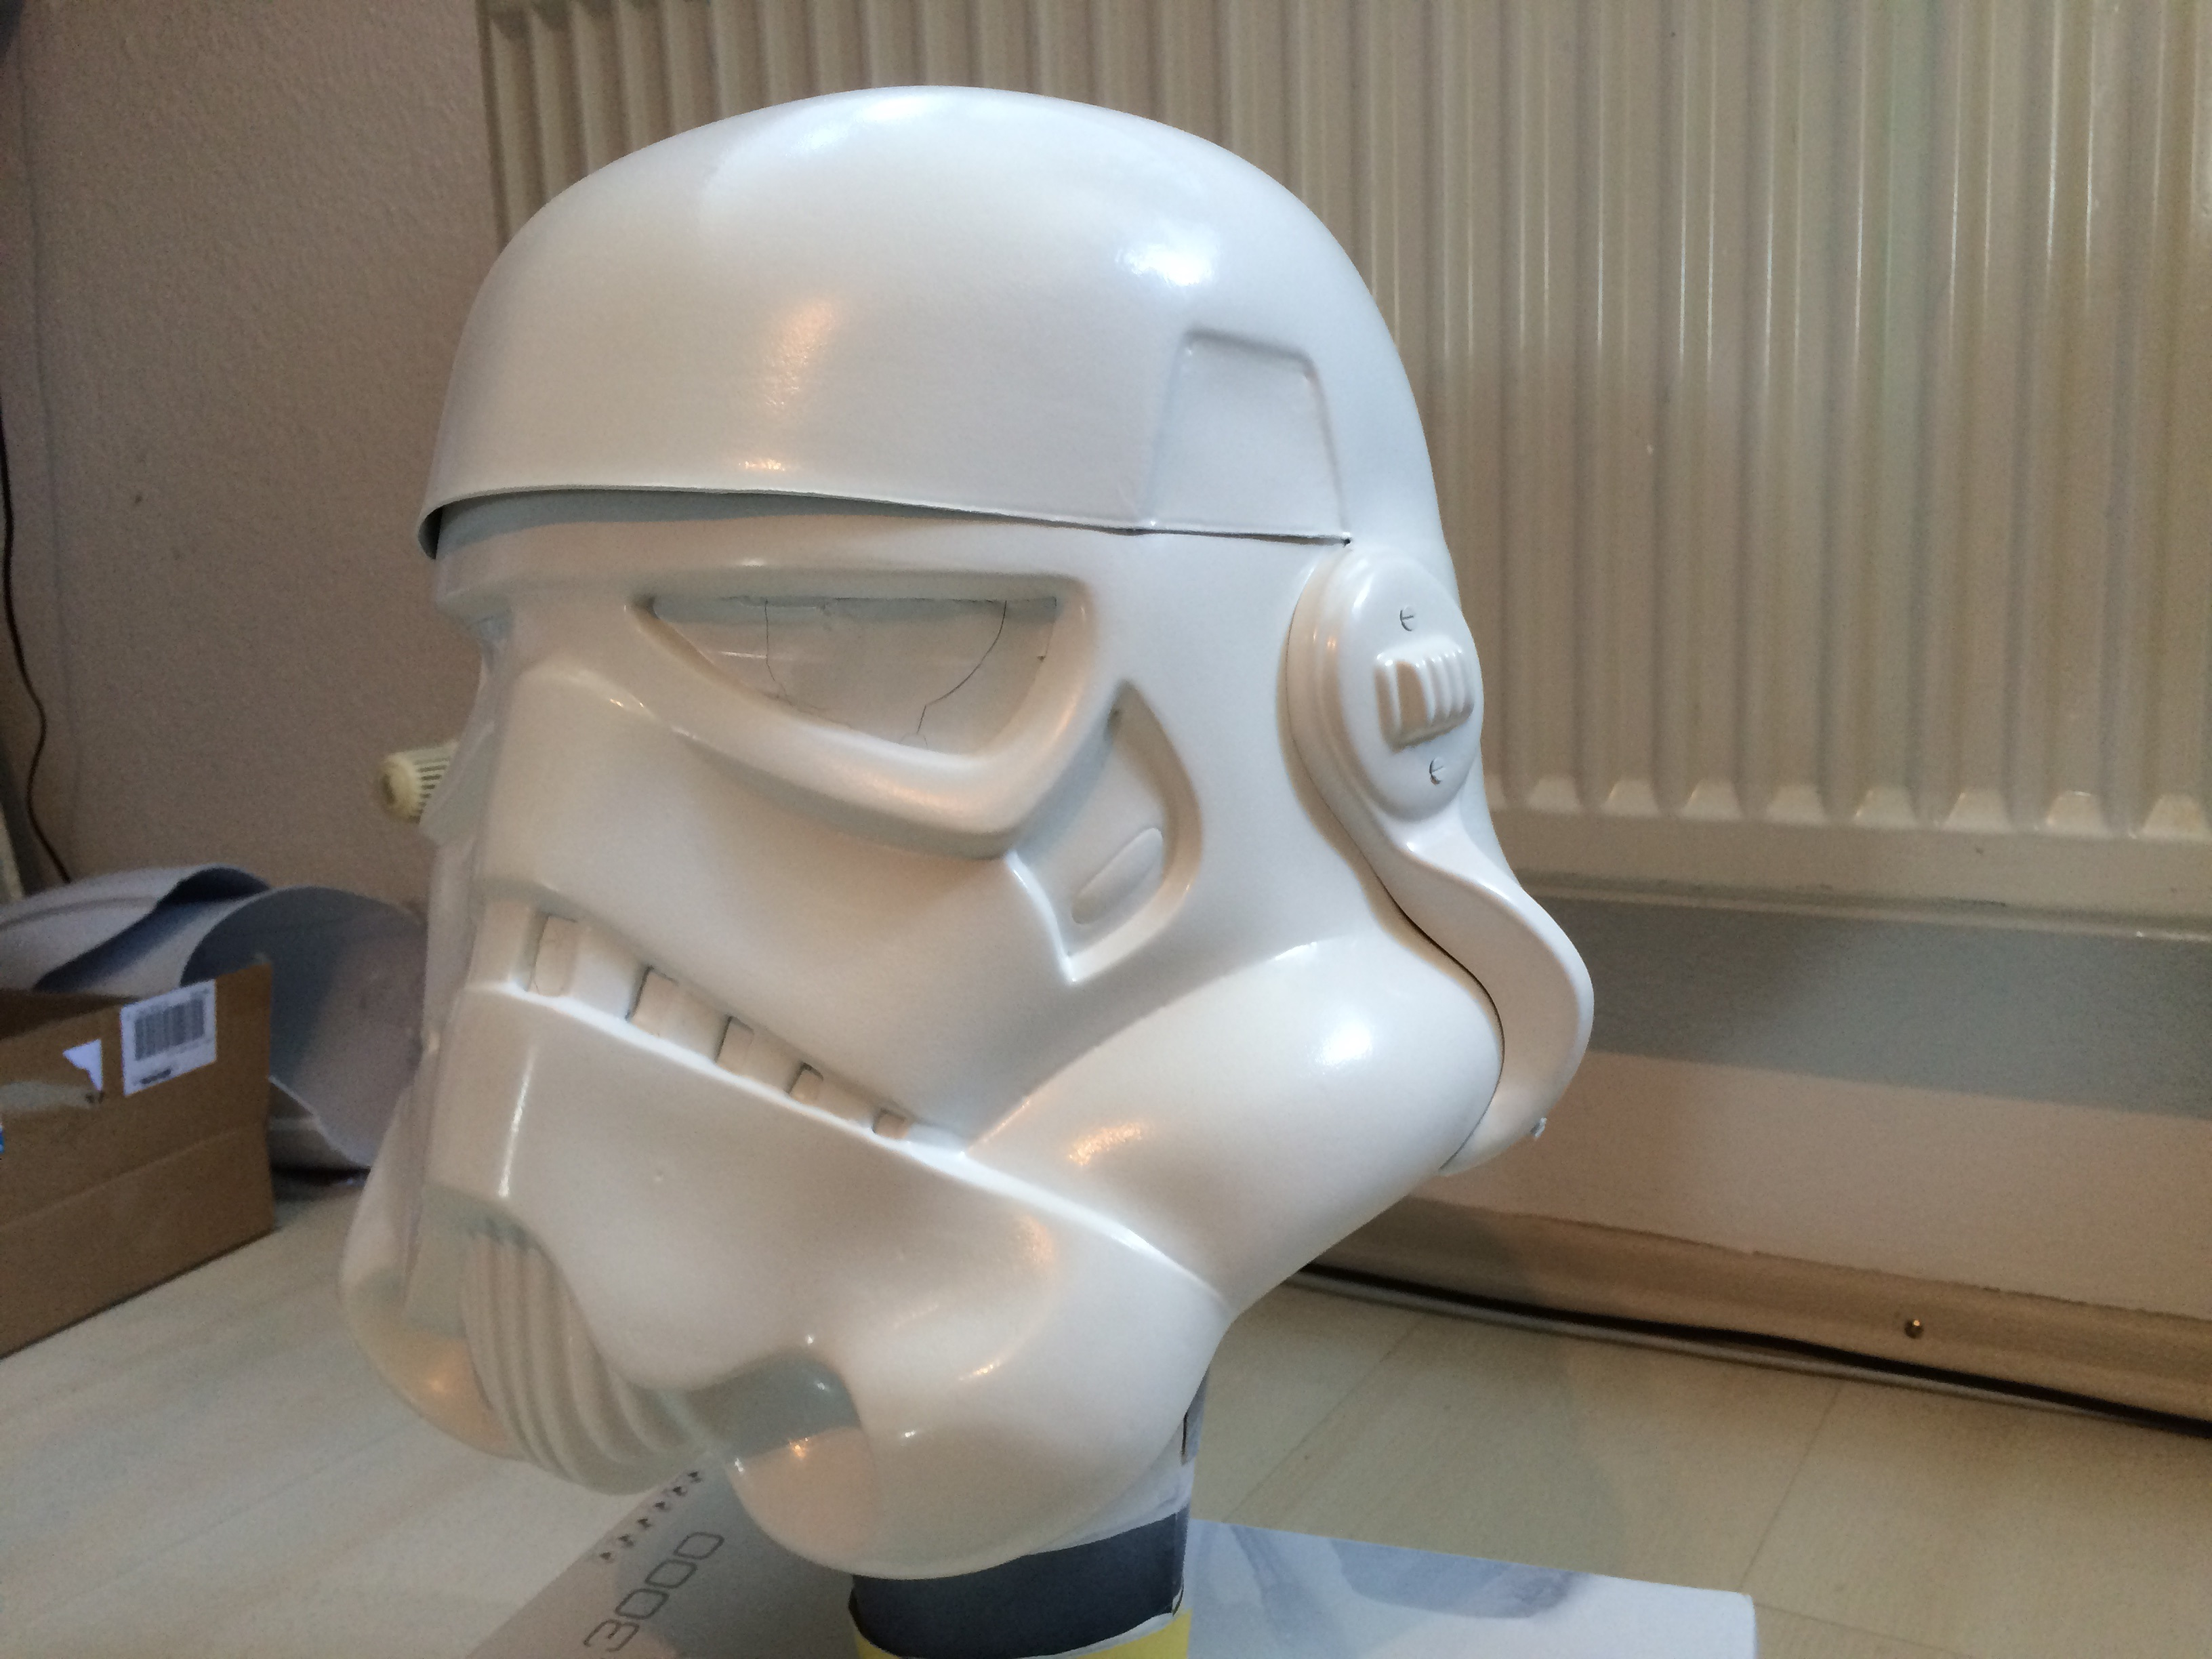 www.bartmarke.net/501st/WIP/FISD/Helmet/HDPE/PaintedLeft.JPG